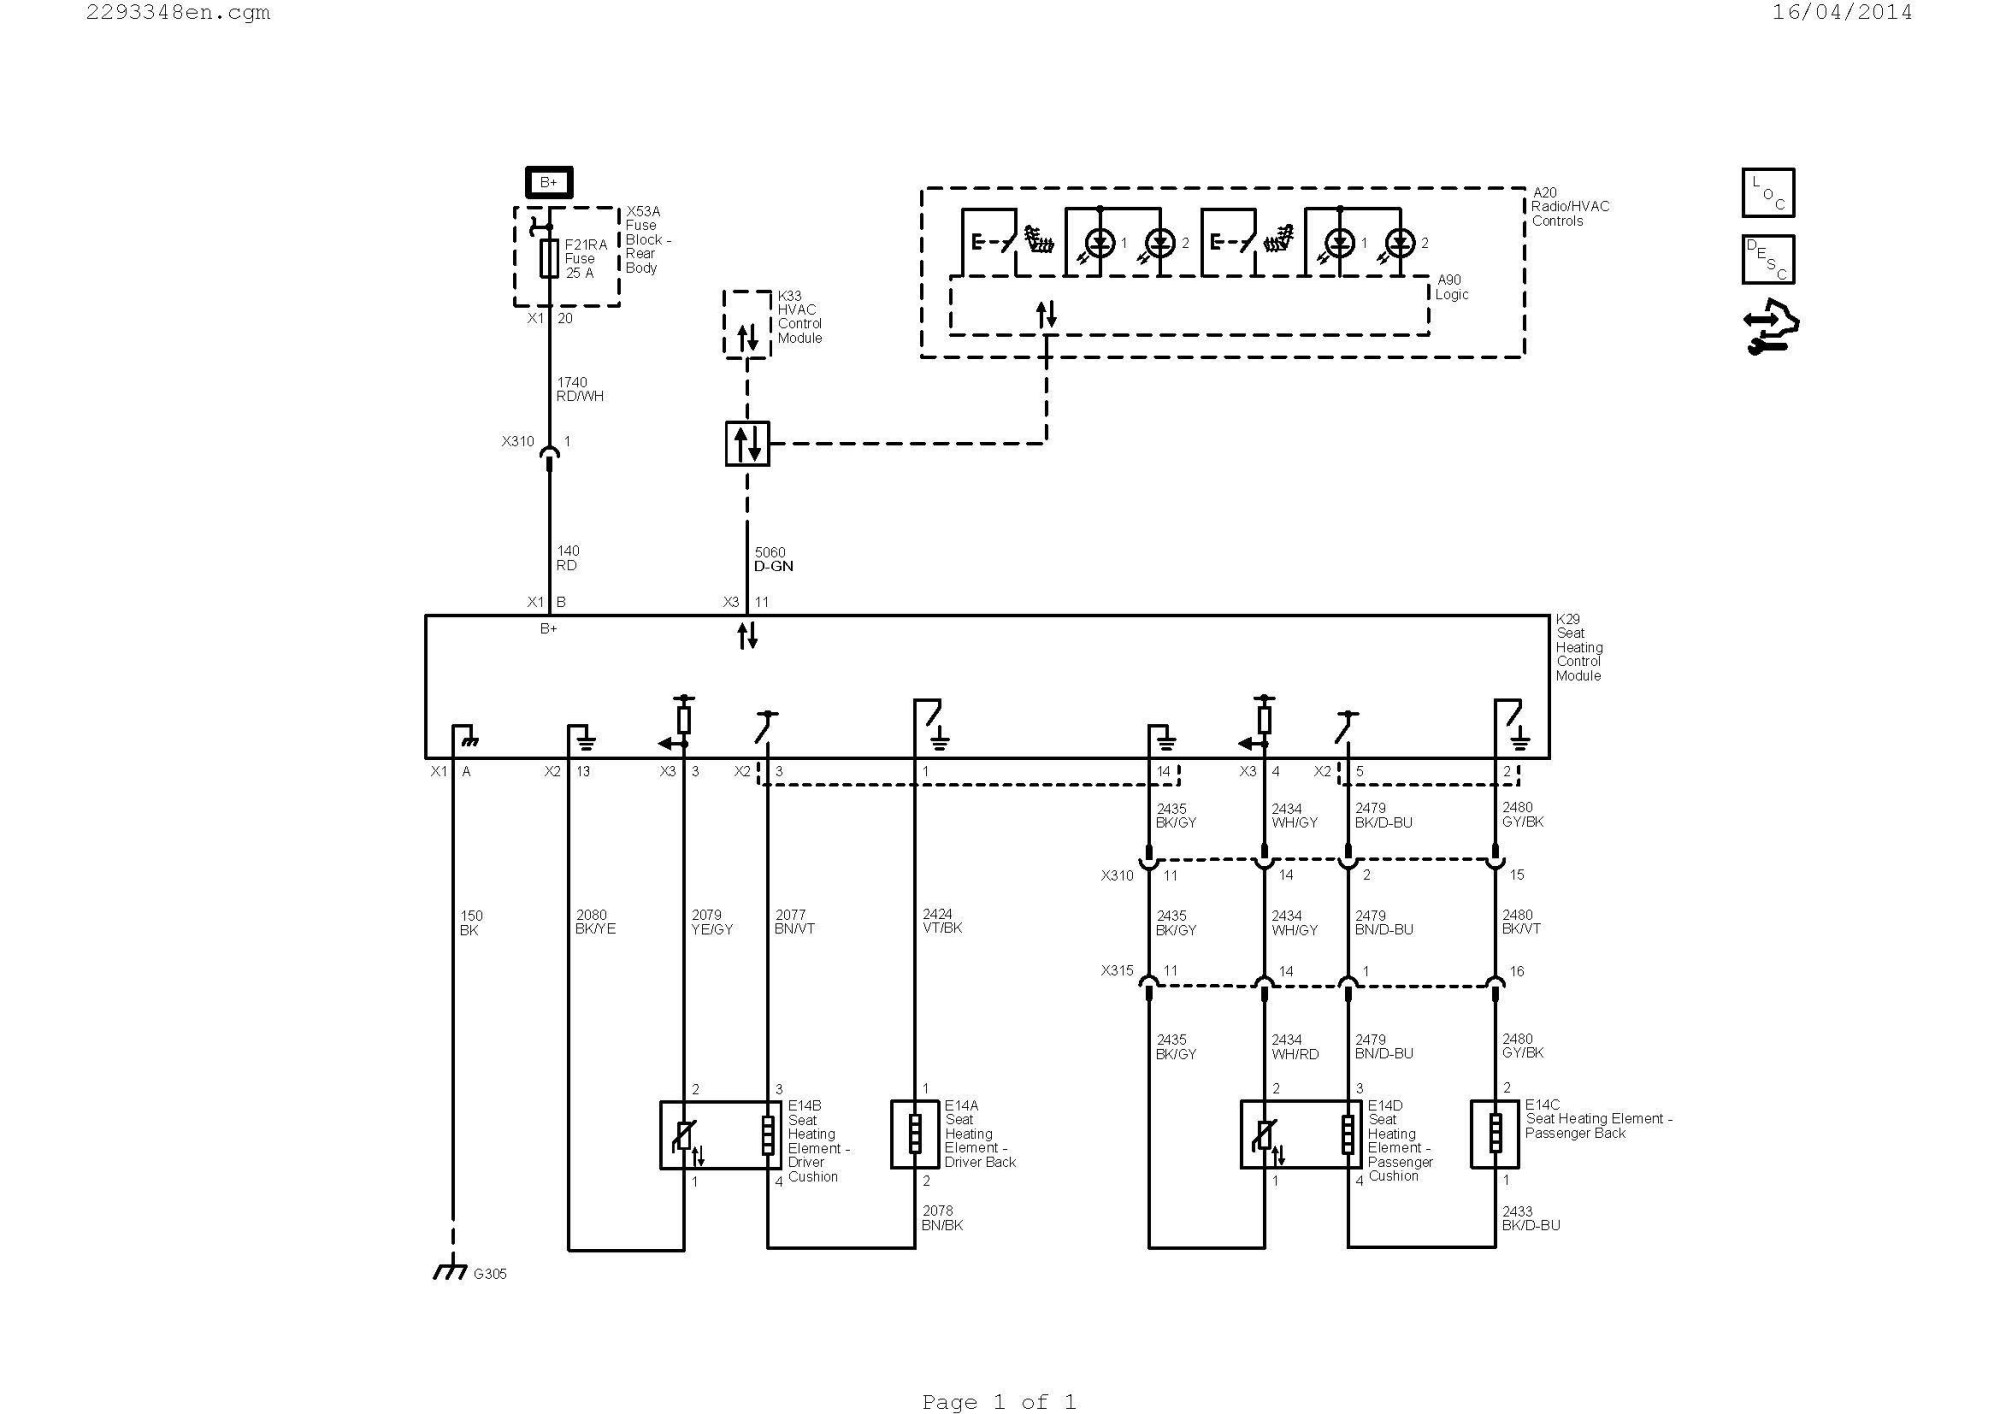 hight resolution of 2001 chevy blazer wiring diagram 1997 chevy s10 wiring diagram collection of 2001 chevy blazer wiring